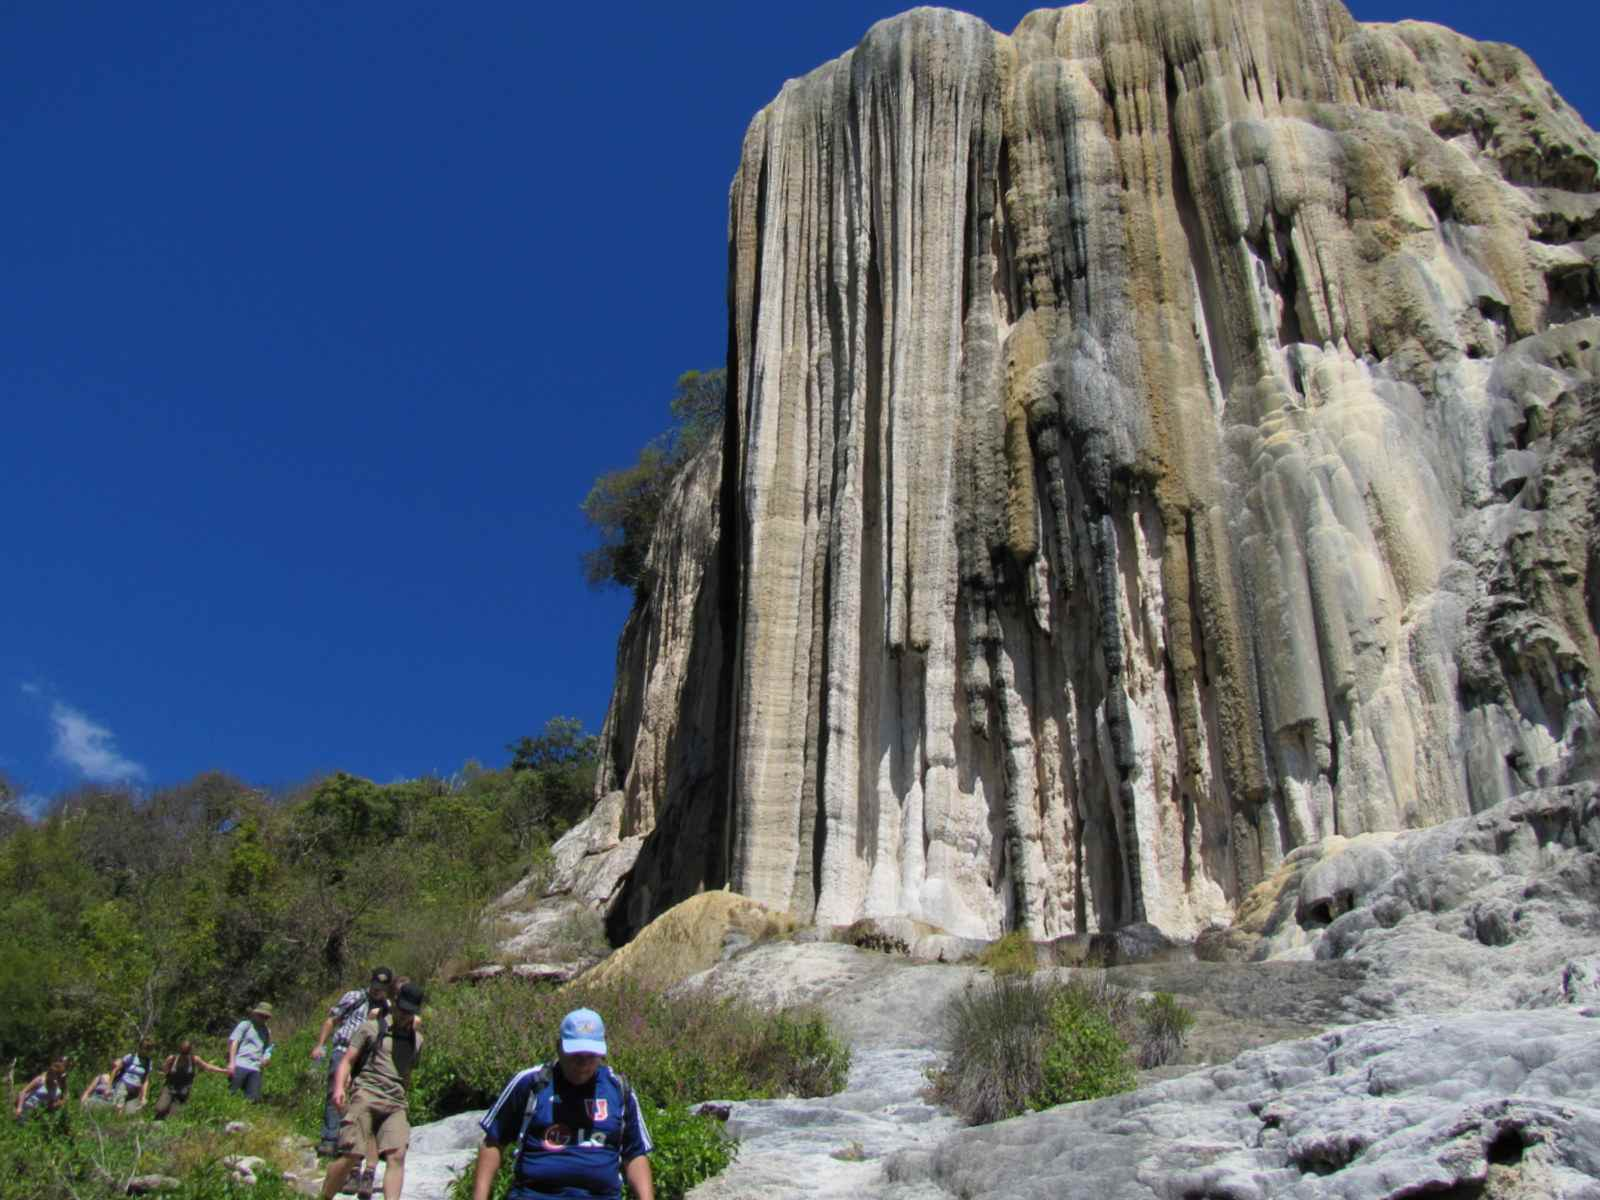 Hike around a petrified waterfall in Oaxaca, Mexico